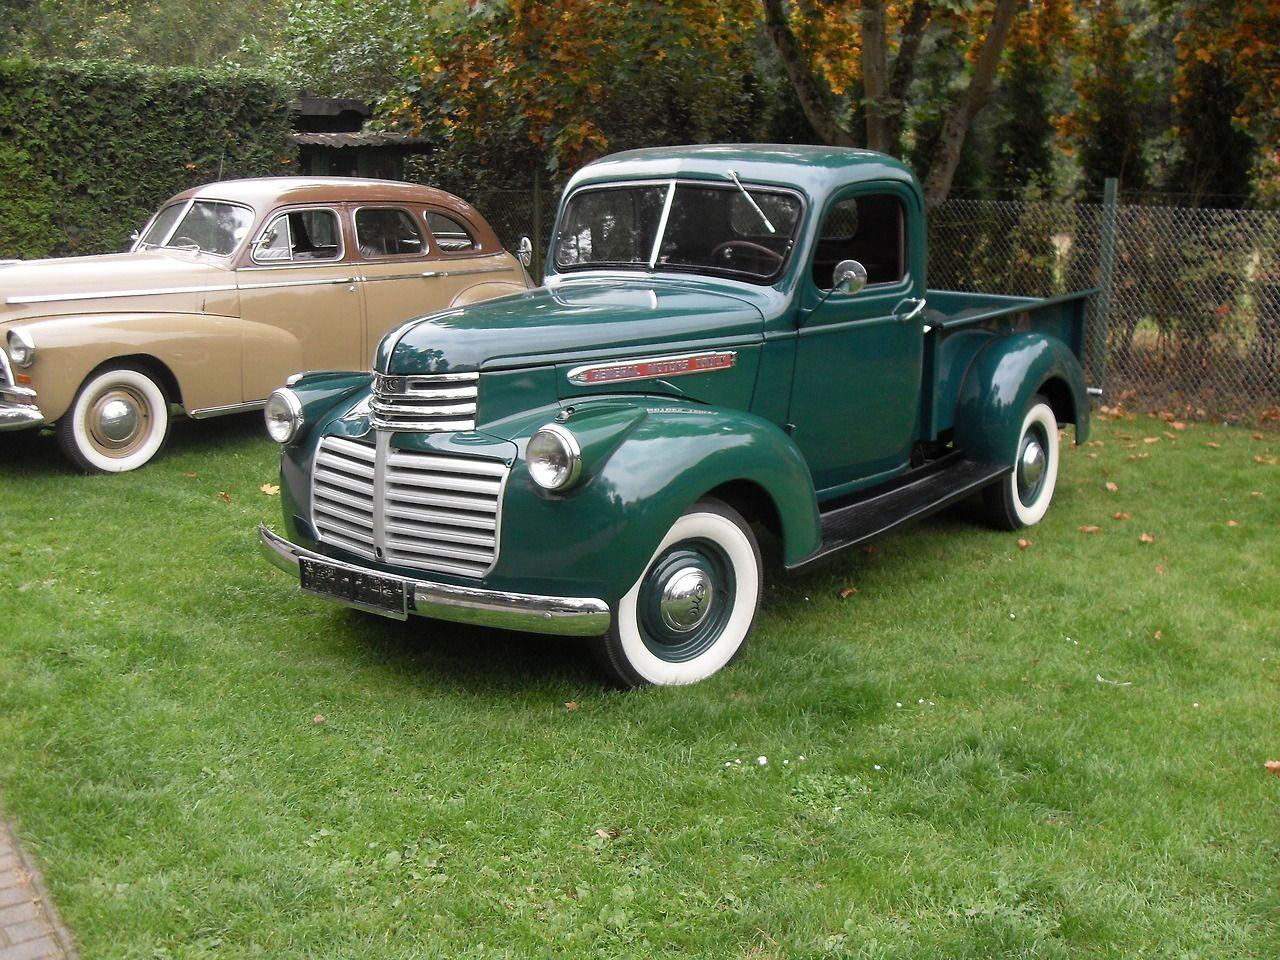 1943 Chevrolet G7117 1 5 Ton Vintage Pickup Trucks Vintage